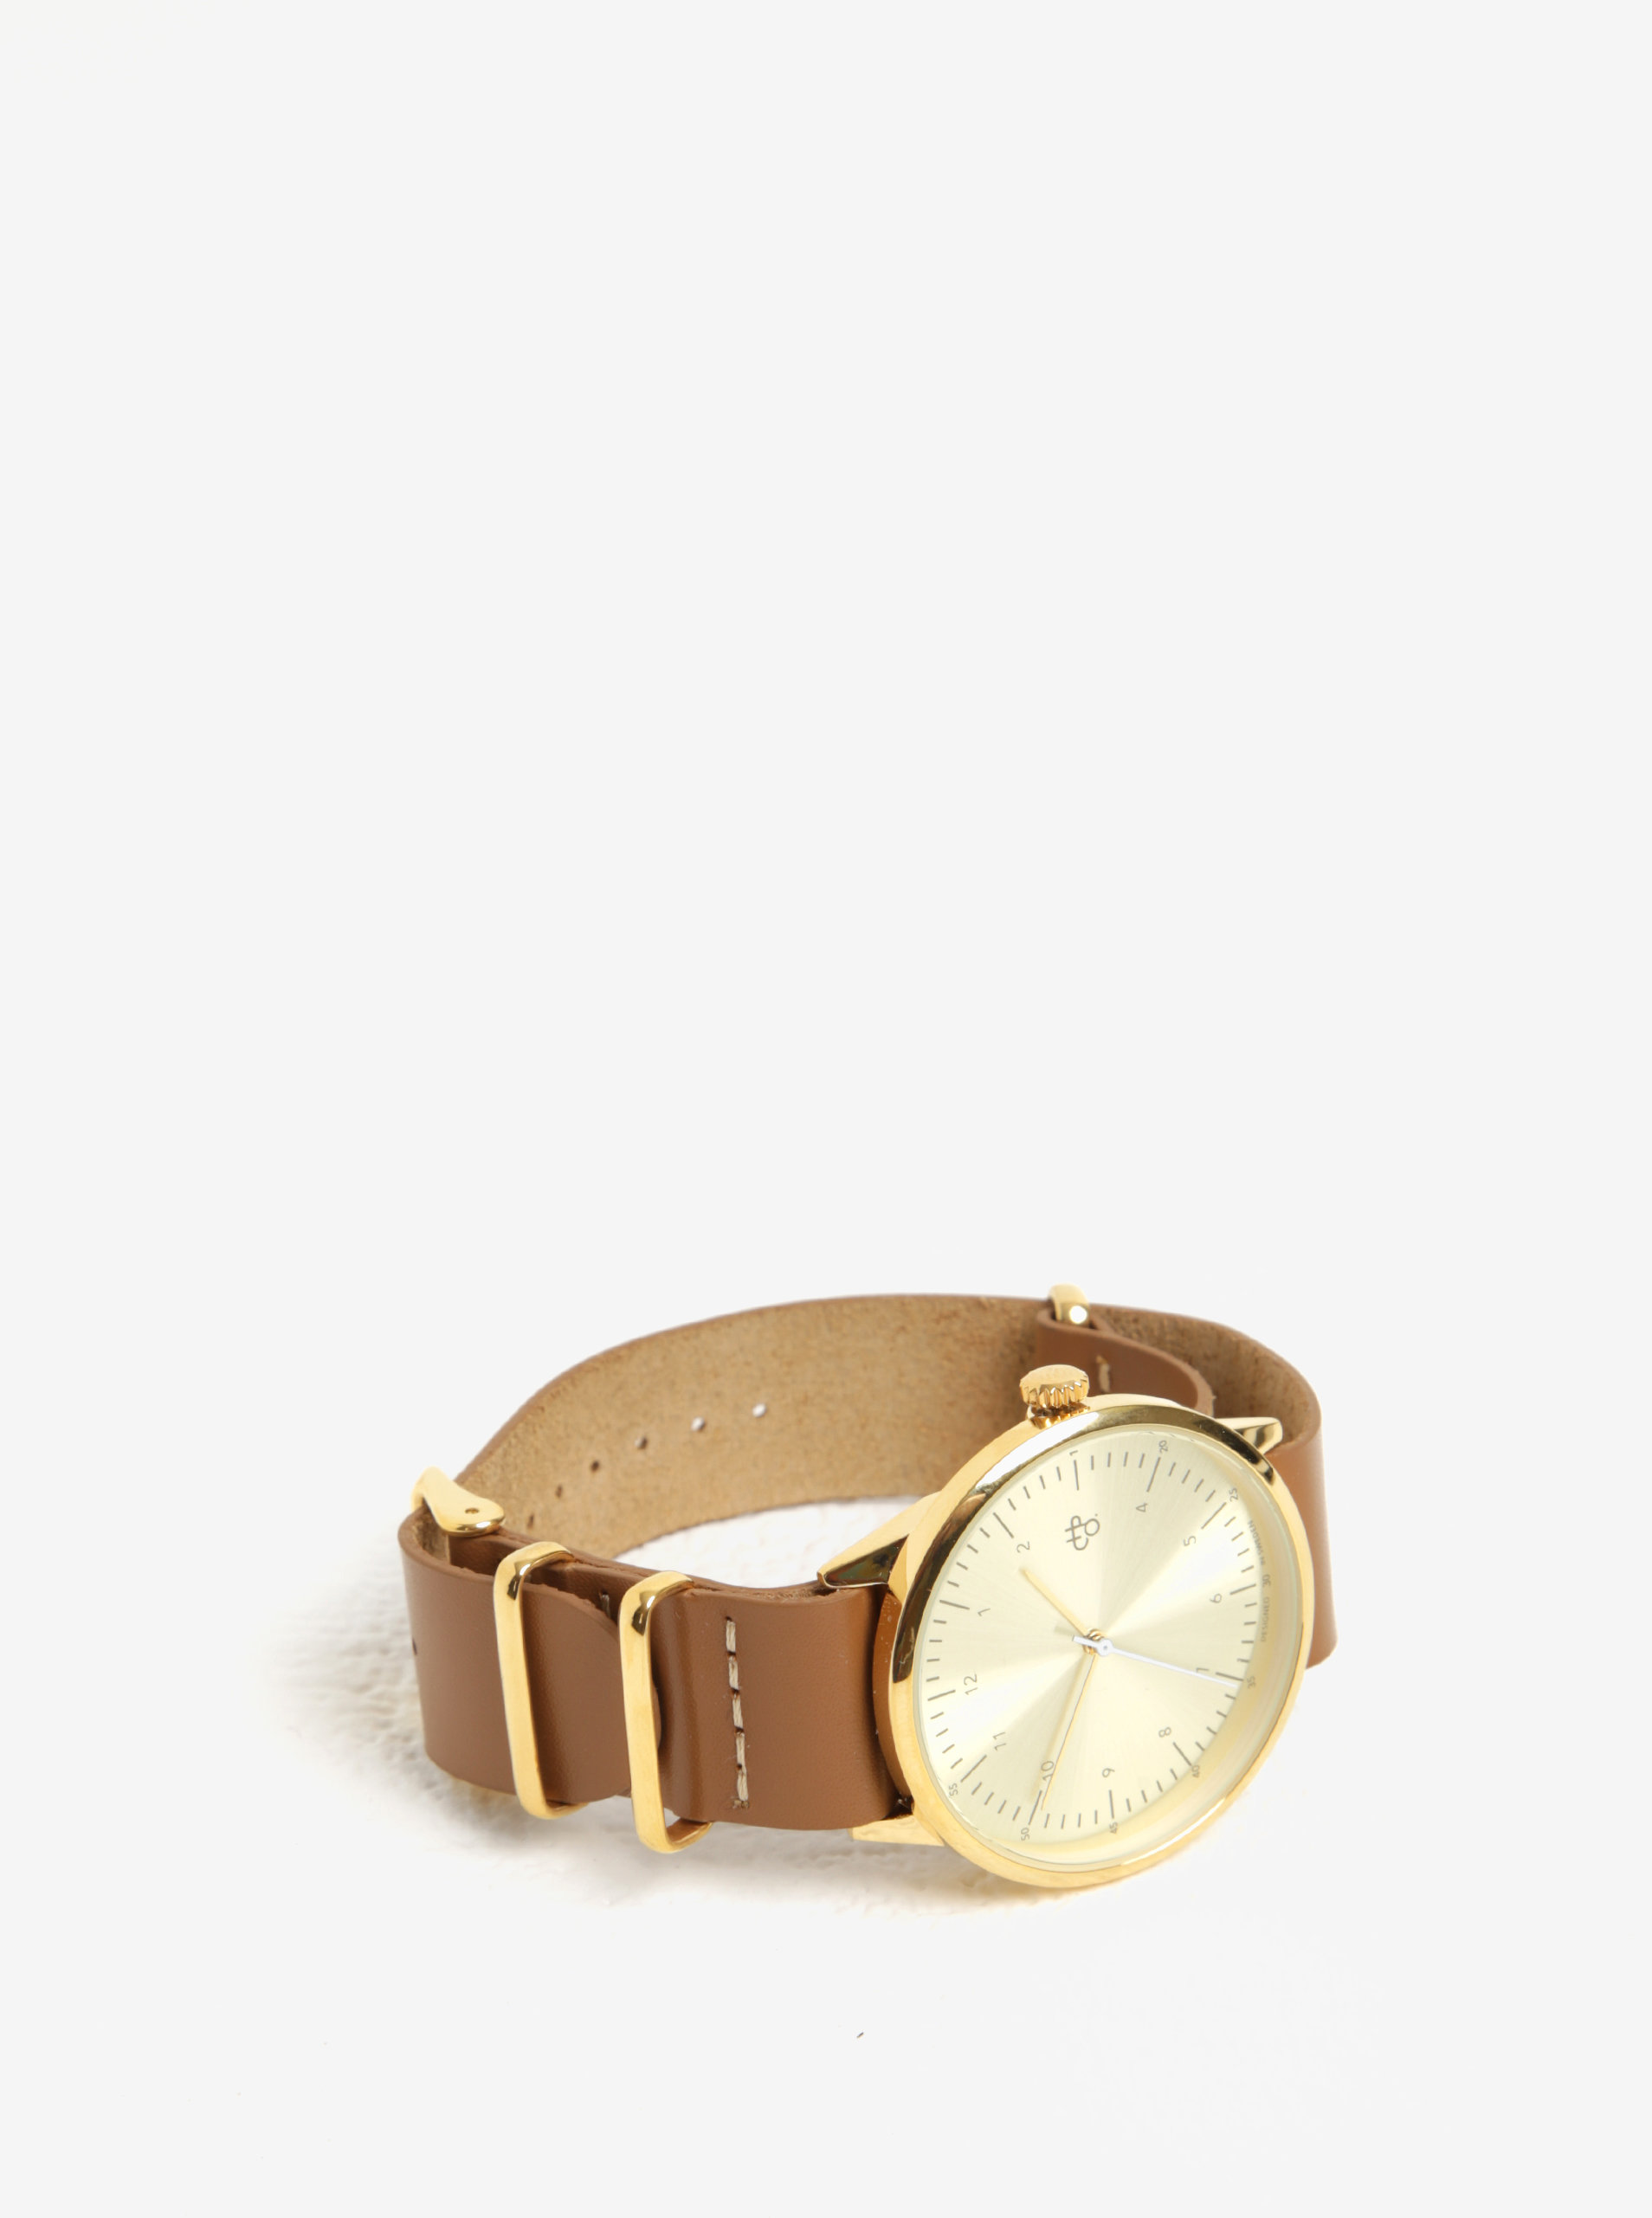 Dámské hodinky s hnědým koženým páskem CHPO Harold ... 96176edb42